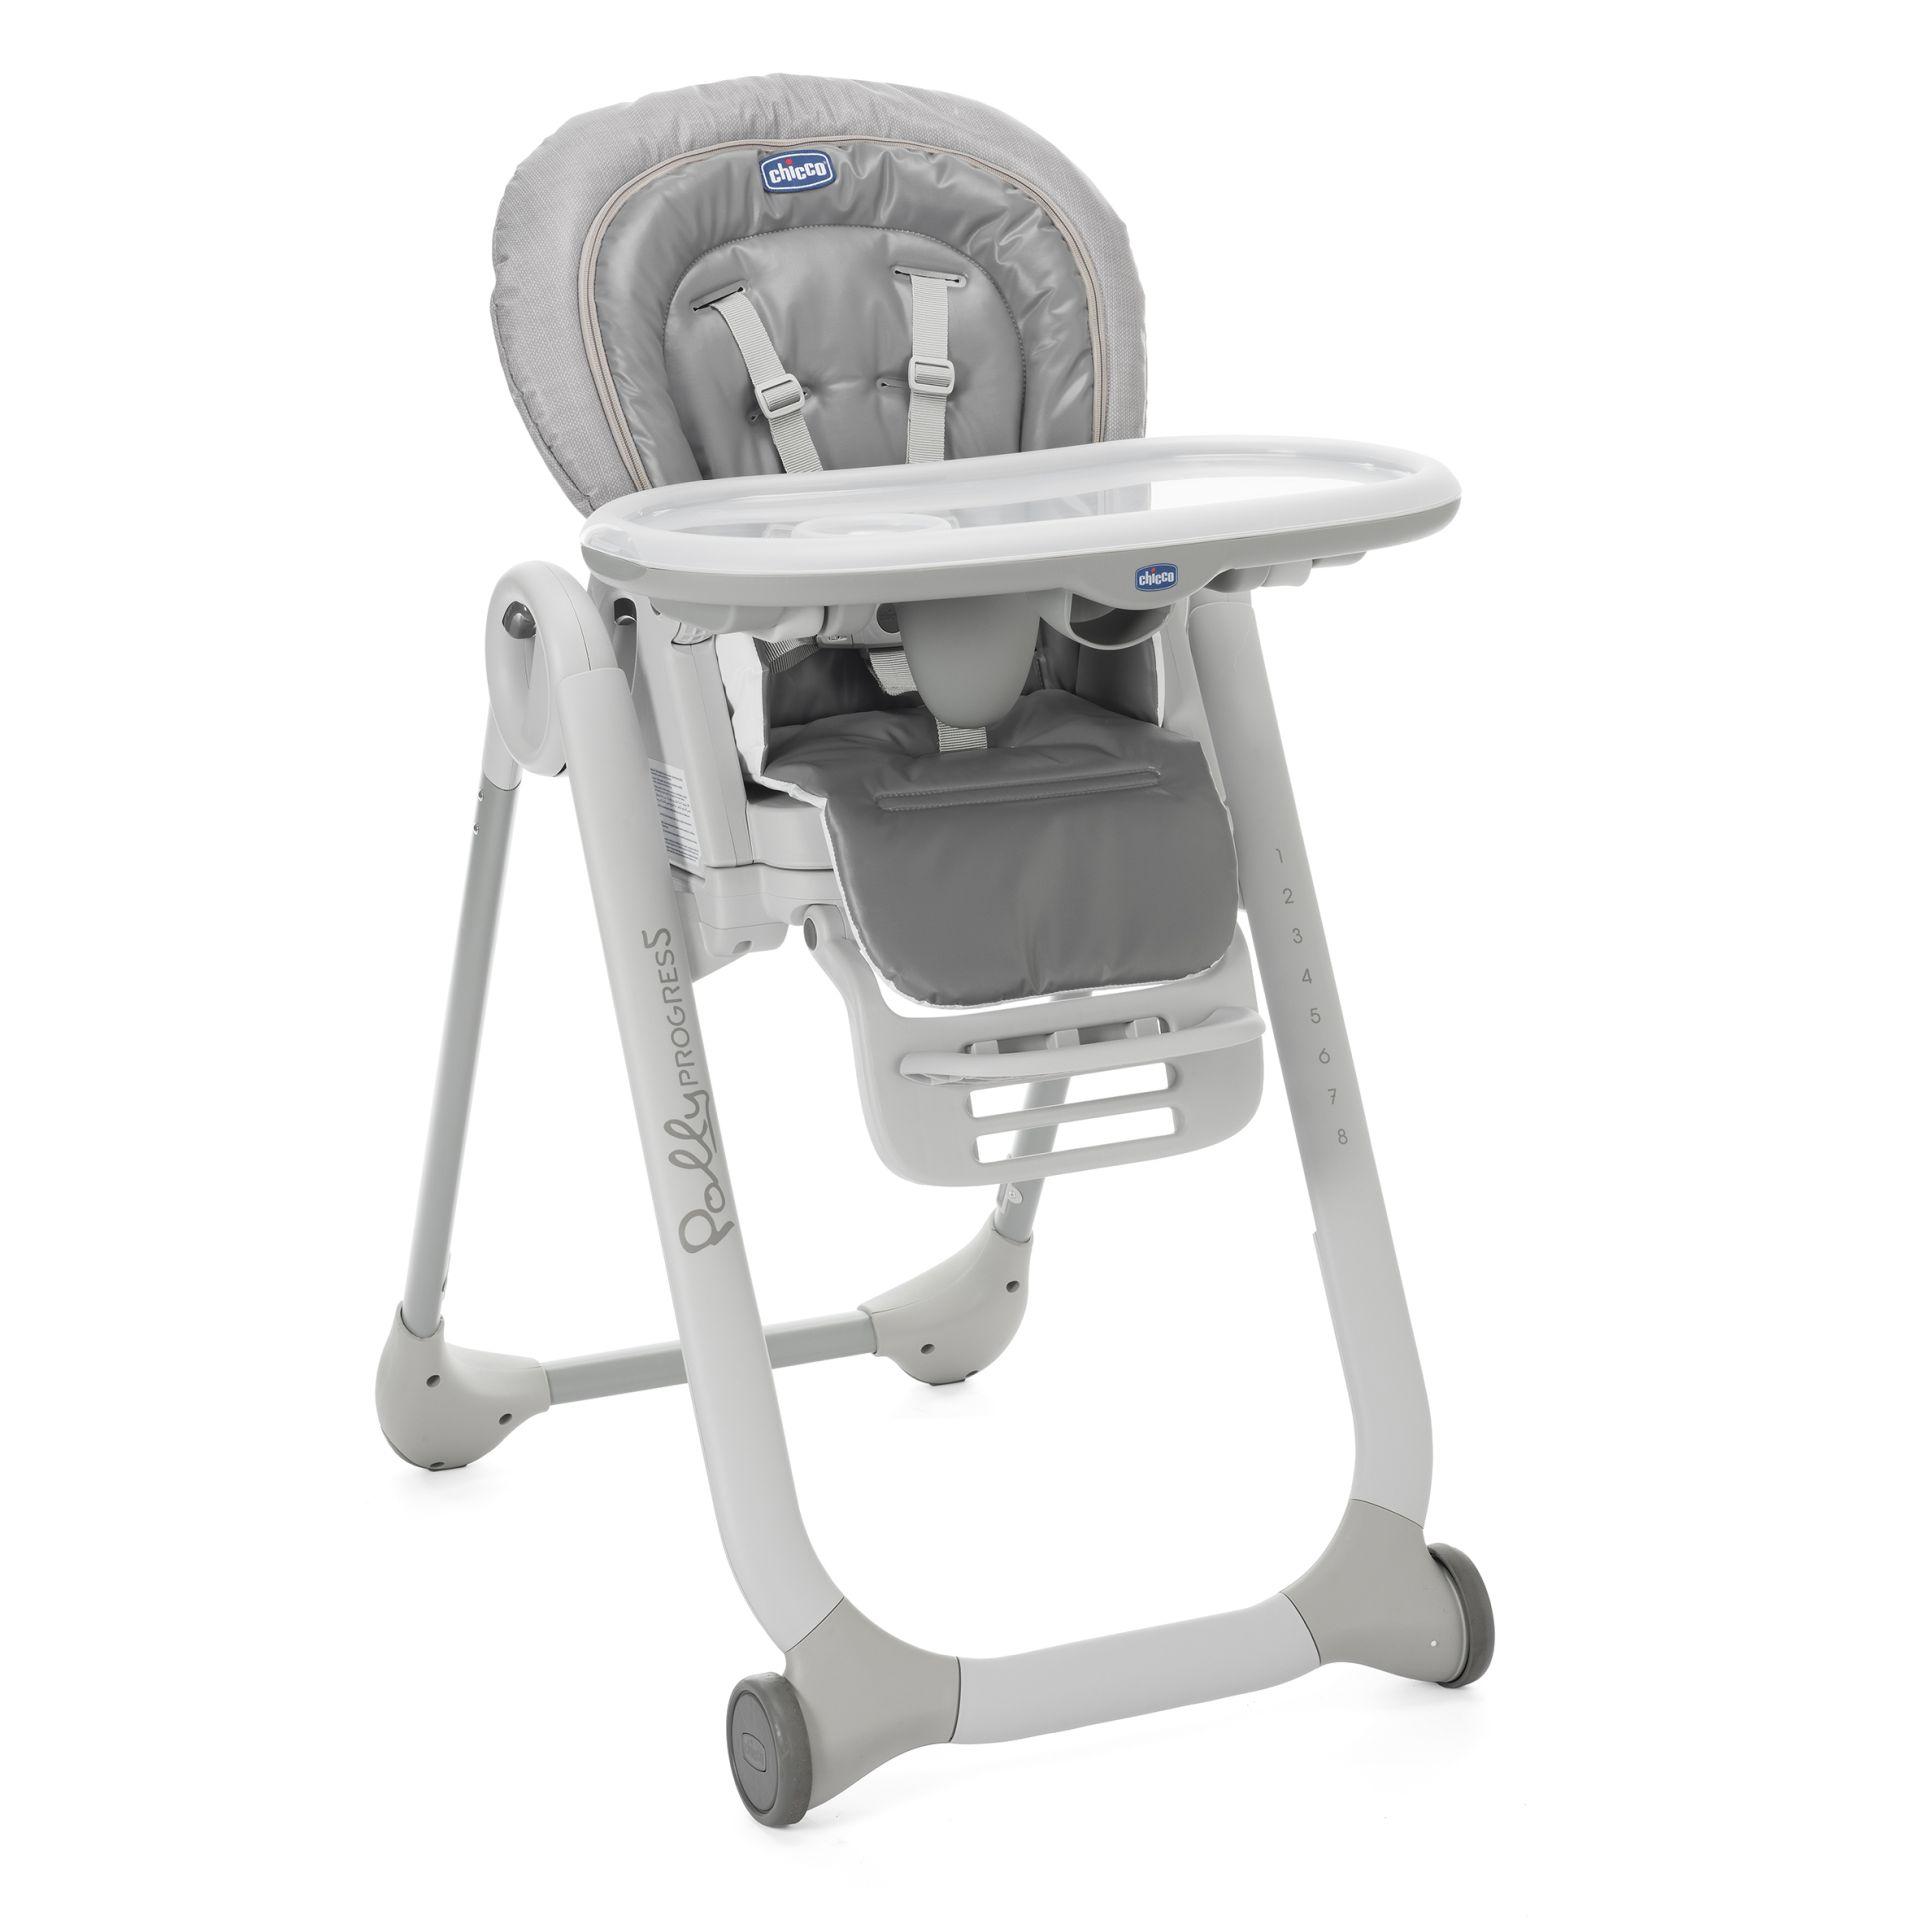 chicco chaise haute polly progres5 2017 stone acheter sur kidsroom b b s la maison. Black Bedroom Furniture Sets. Home Design Ideas